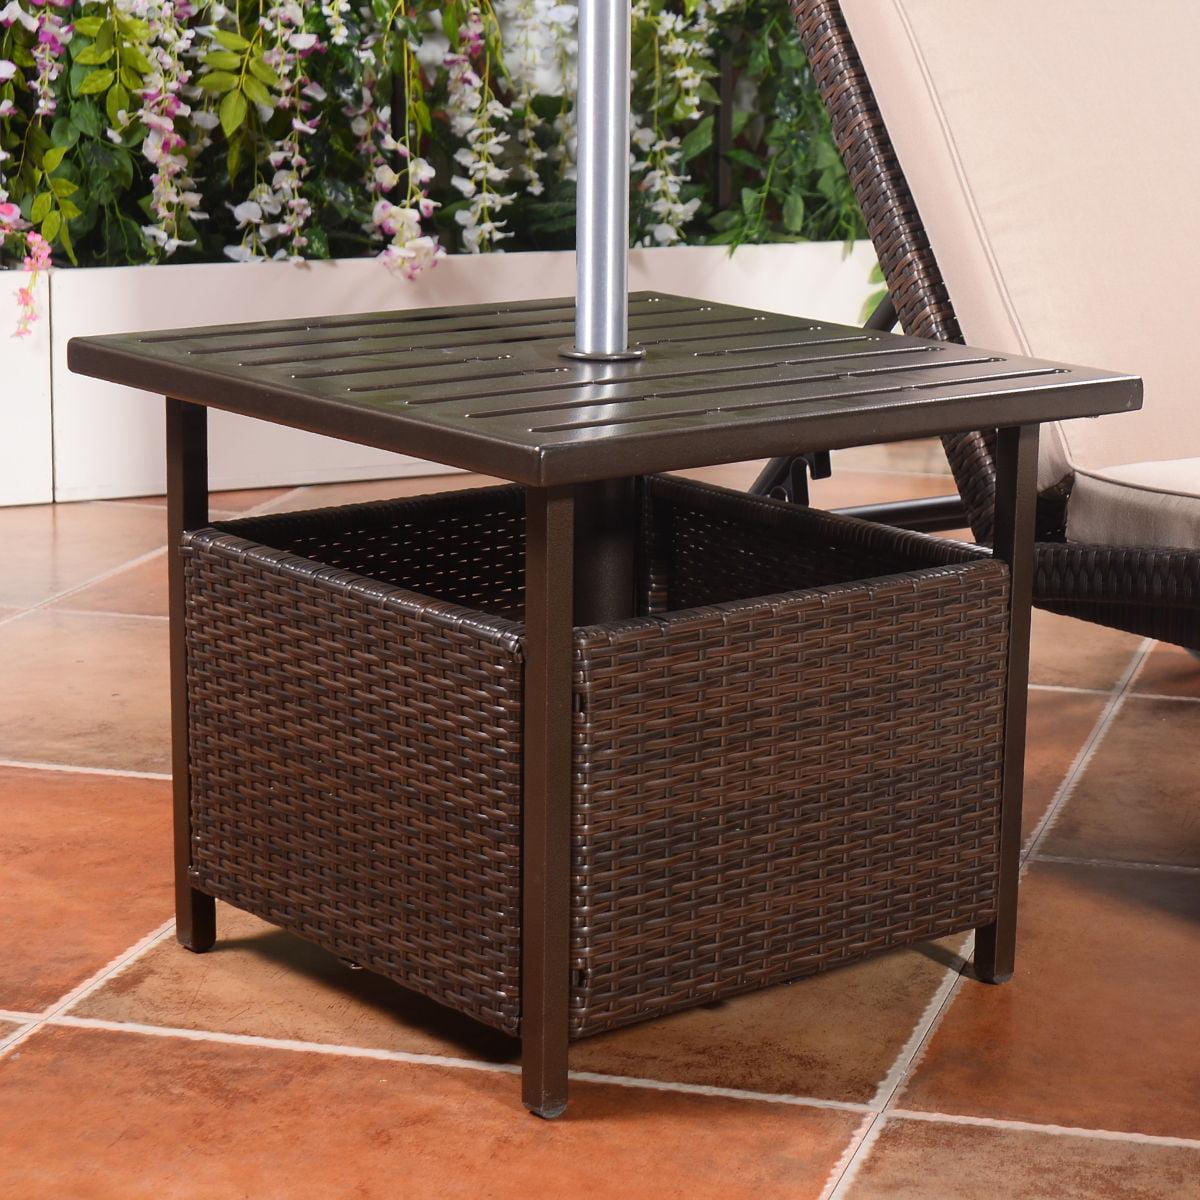 Costway Brown Rattan Wicker Steel Side Table Outdoor Furniture